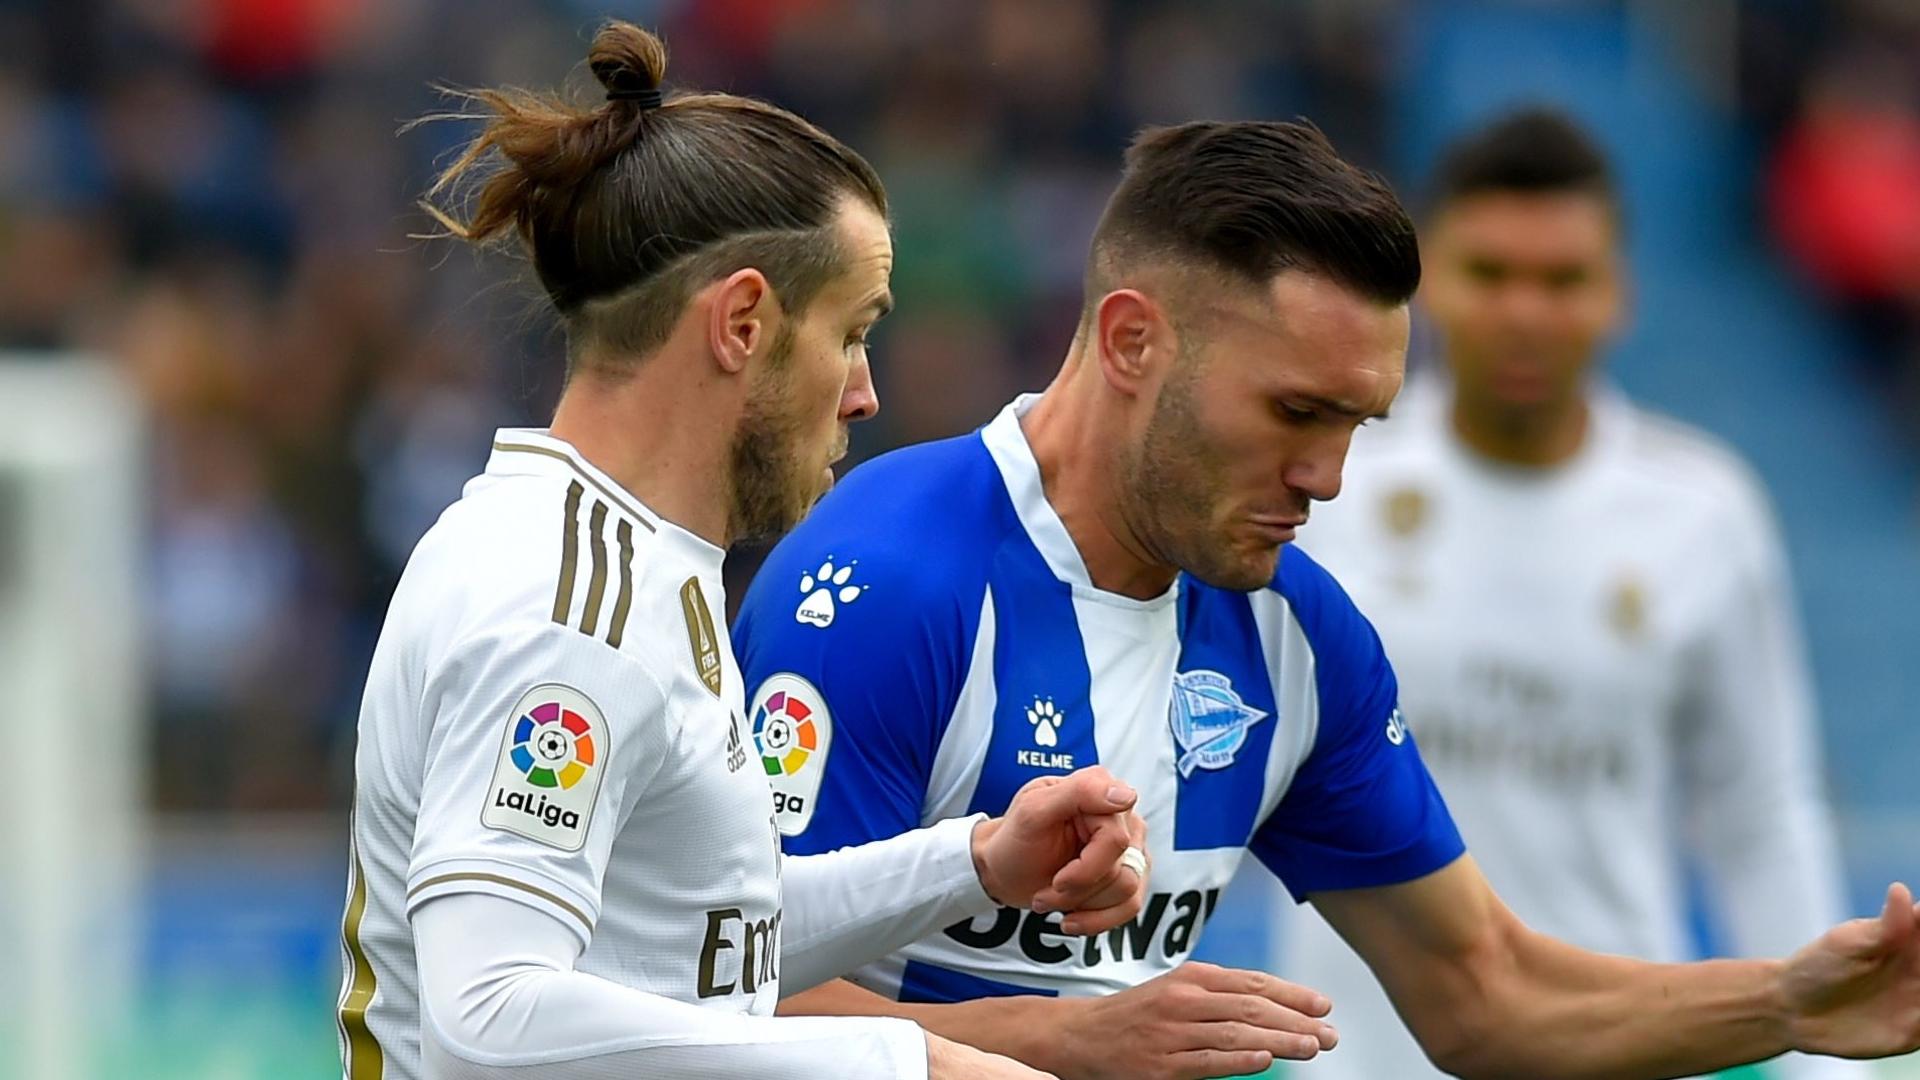 Alaves-Real Madrid 1-2, le Real met la pression sur le Barça